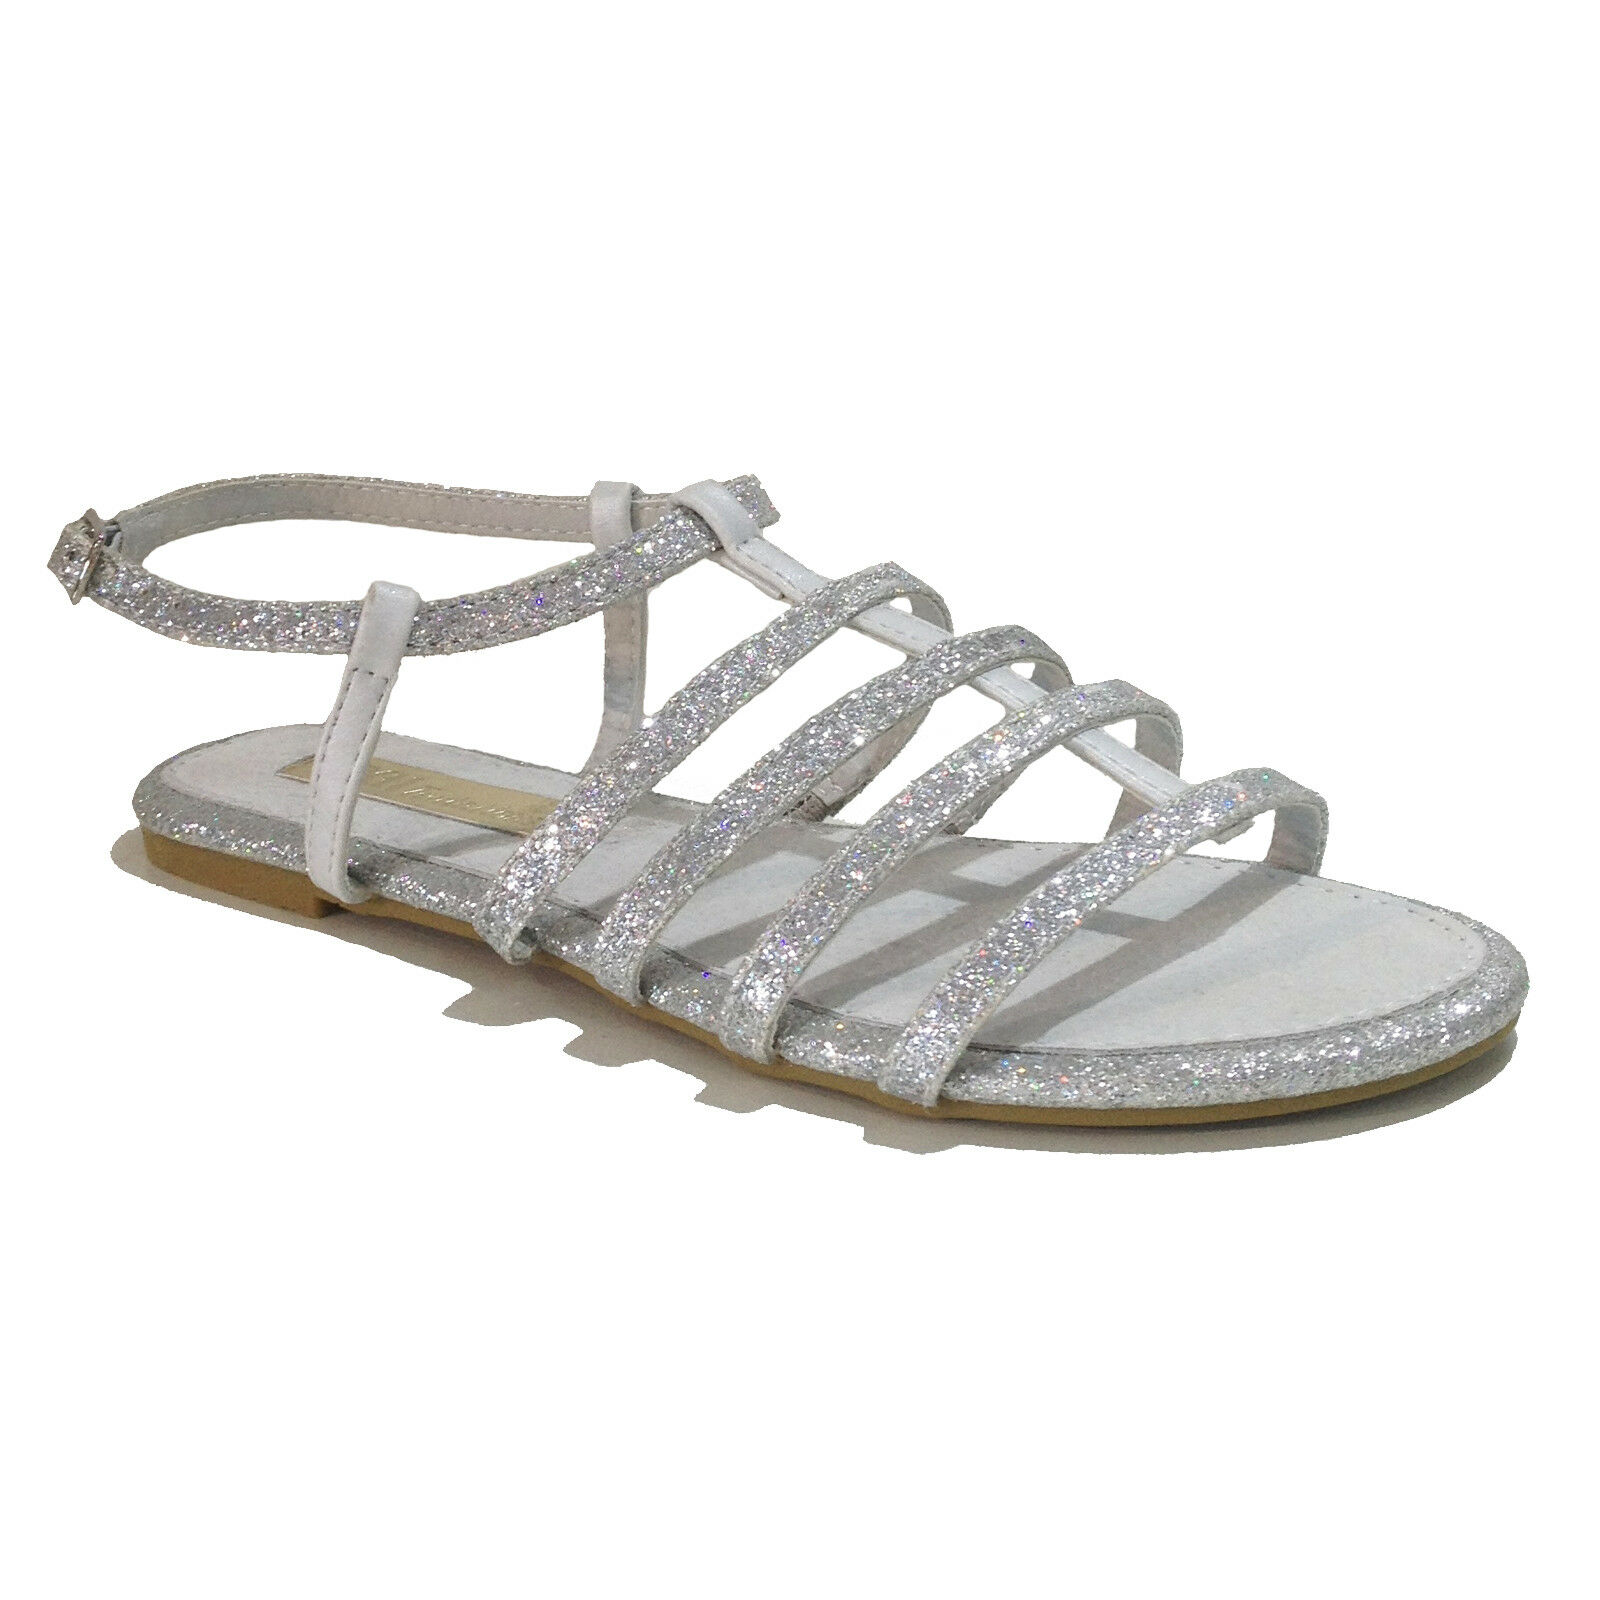 ☼ELEN☼ Sandales - Xti  - Ref: 0815